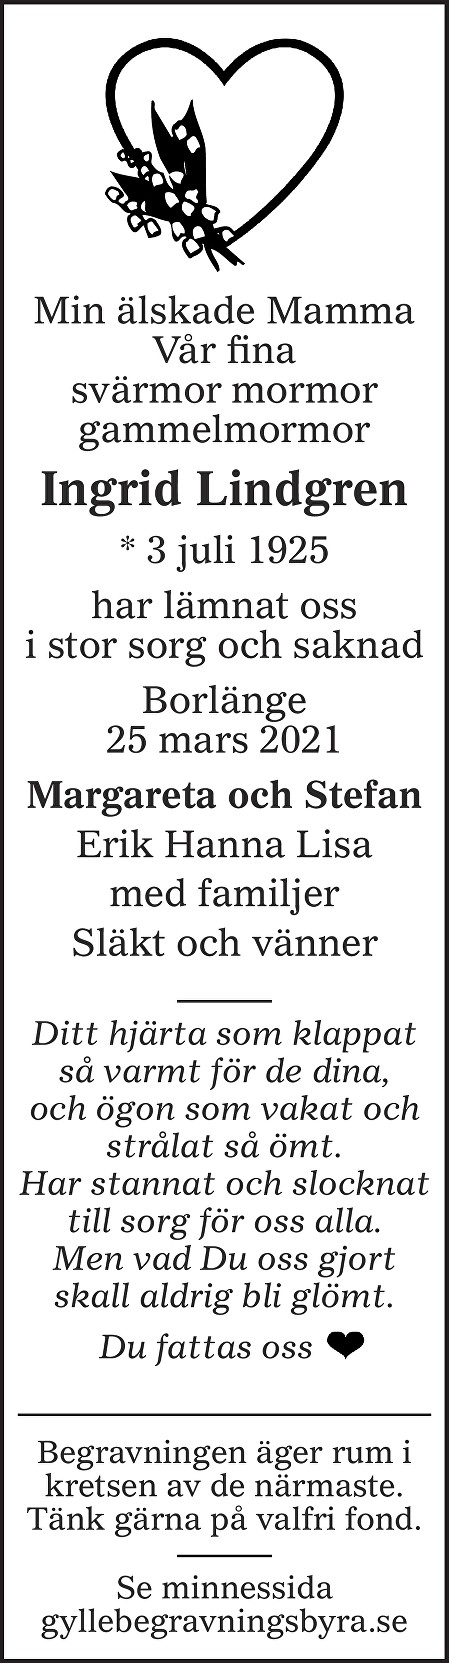 Ingrid Lindgren Death notice